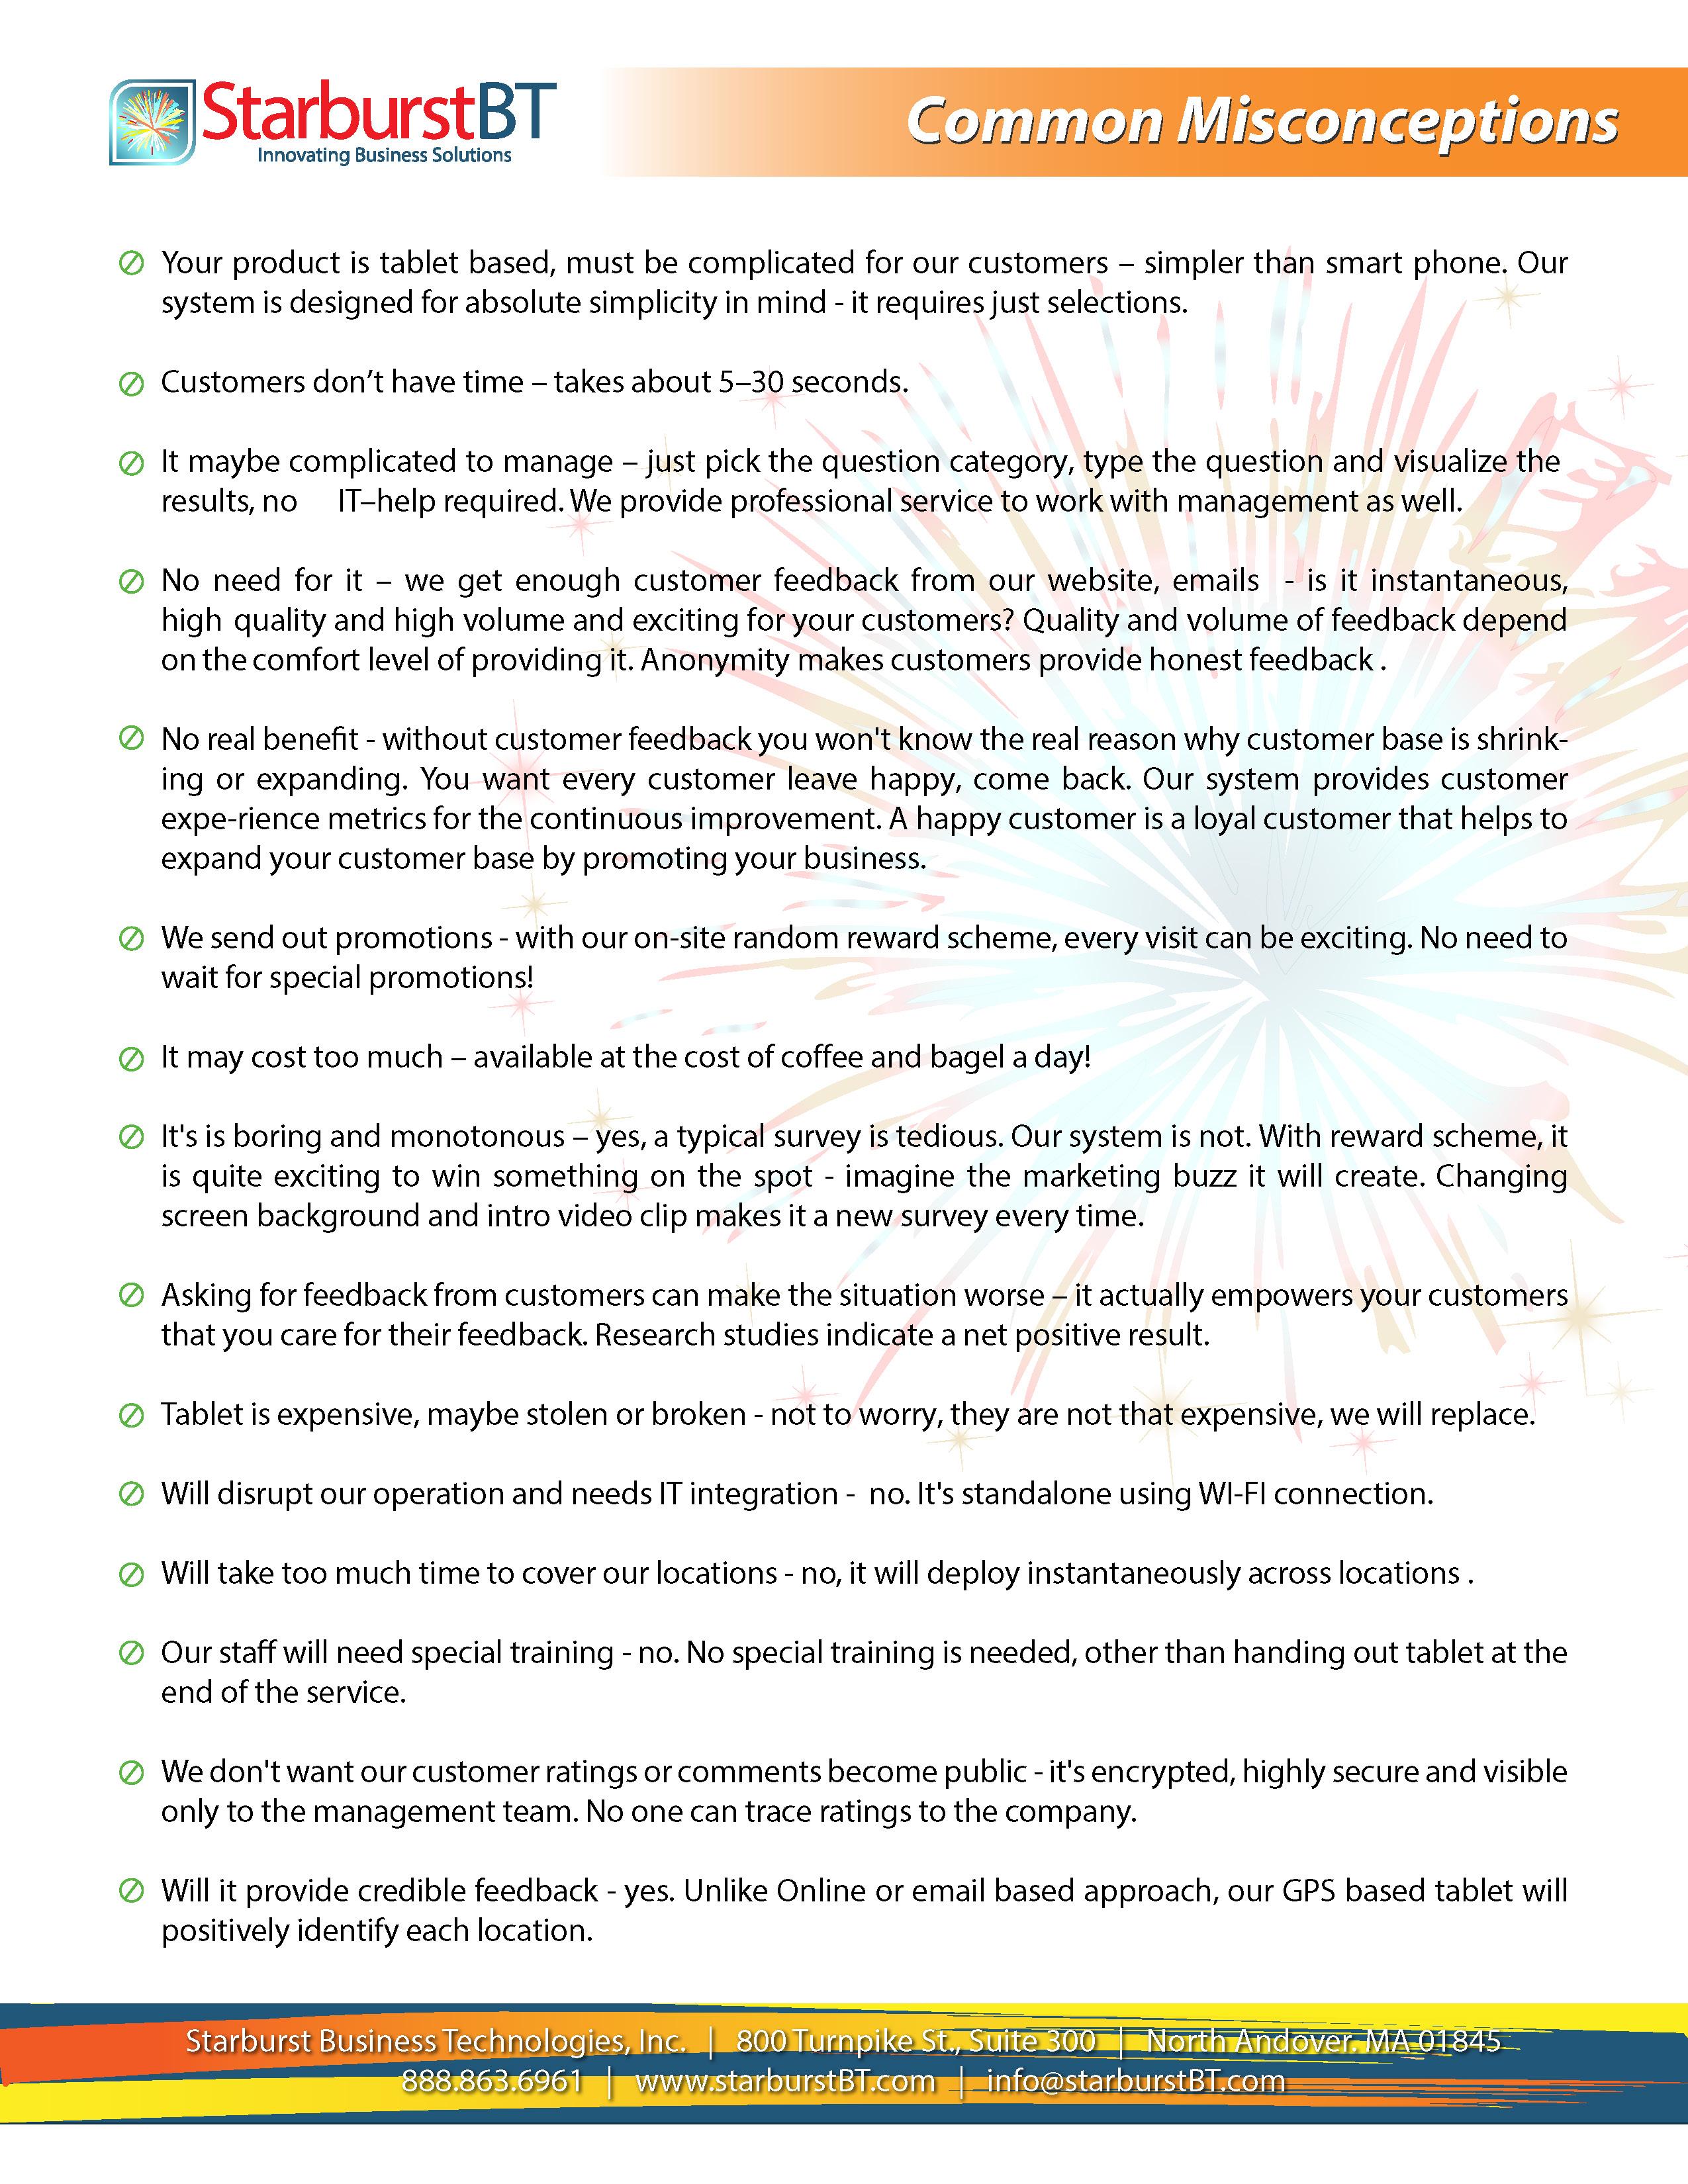 Common-Misconceptions-about-Imprezza-1